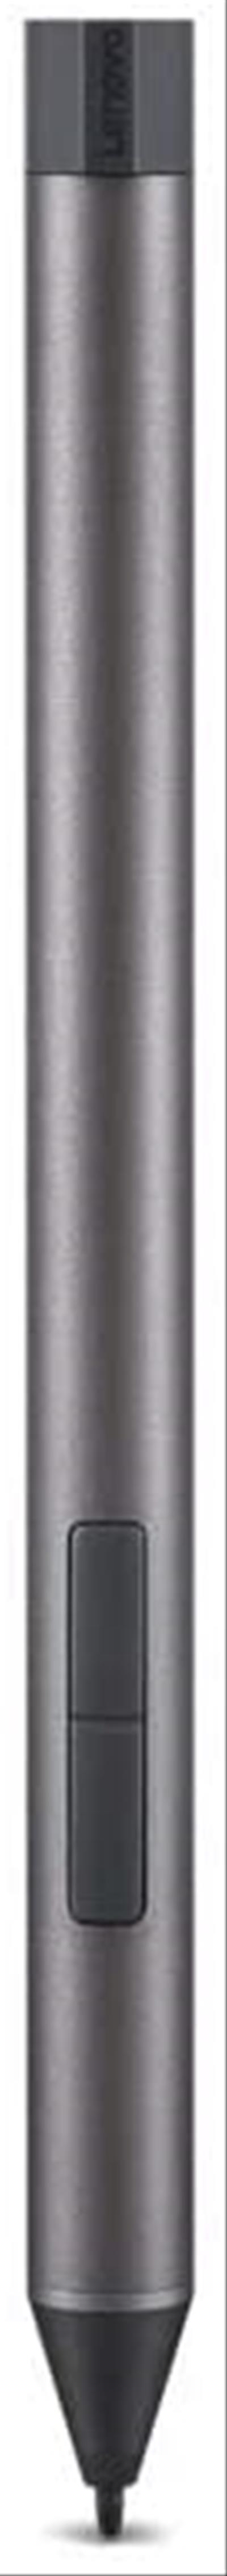 Lápiz Lenovo GX80U45010 Digital Pen